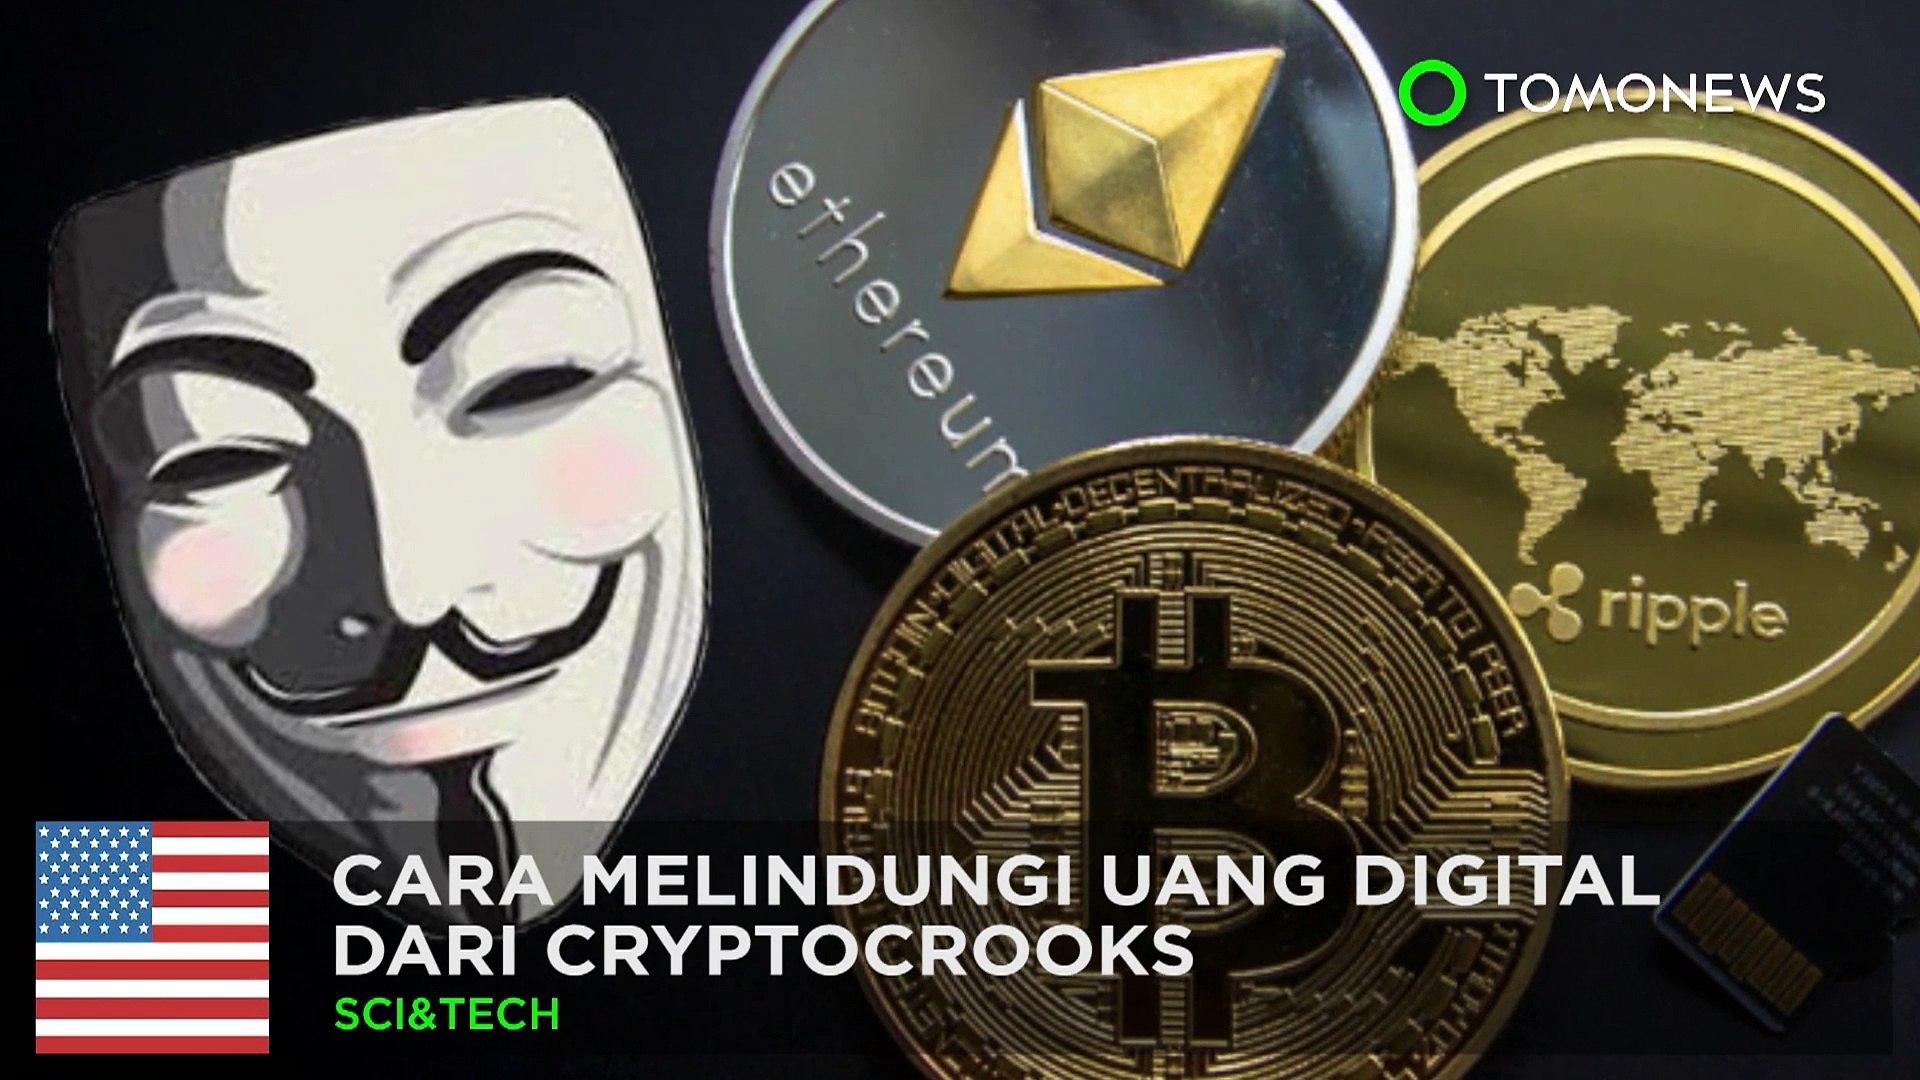 Pencuri Crypto: Bagaimana cara lindungi cryptocurrency dari pencuri - TomoNews